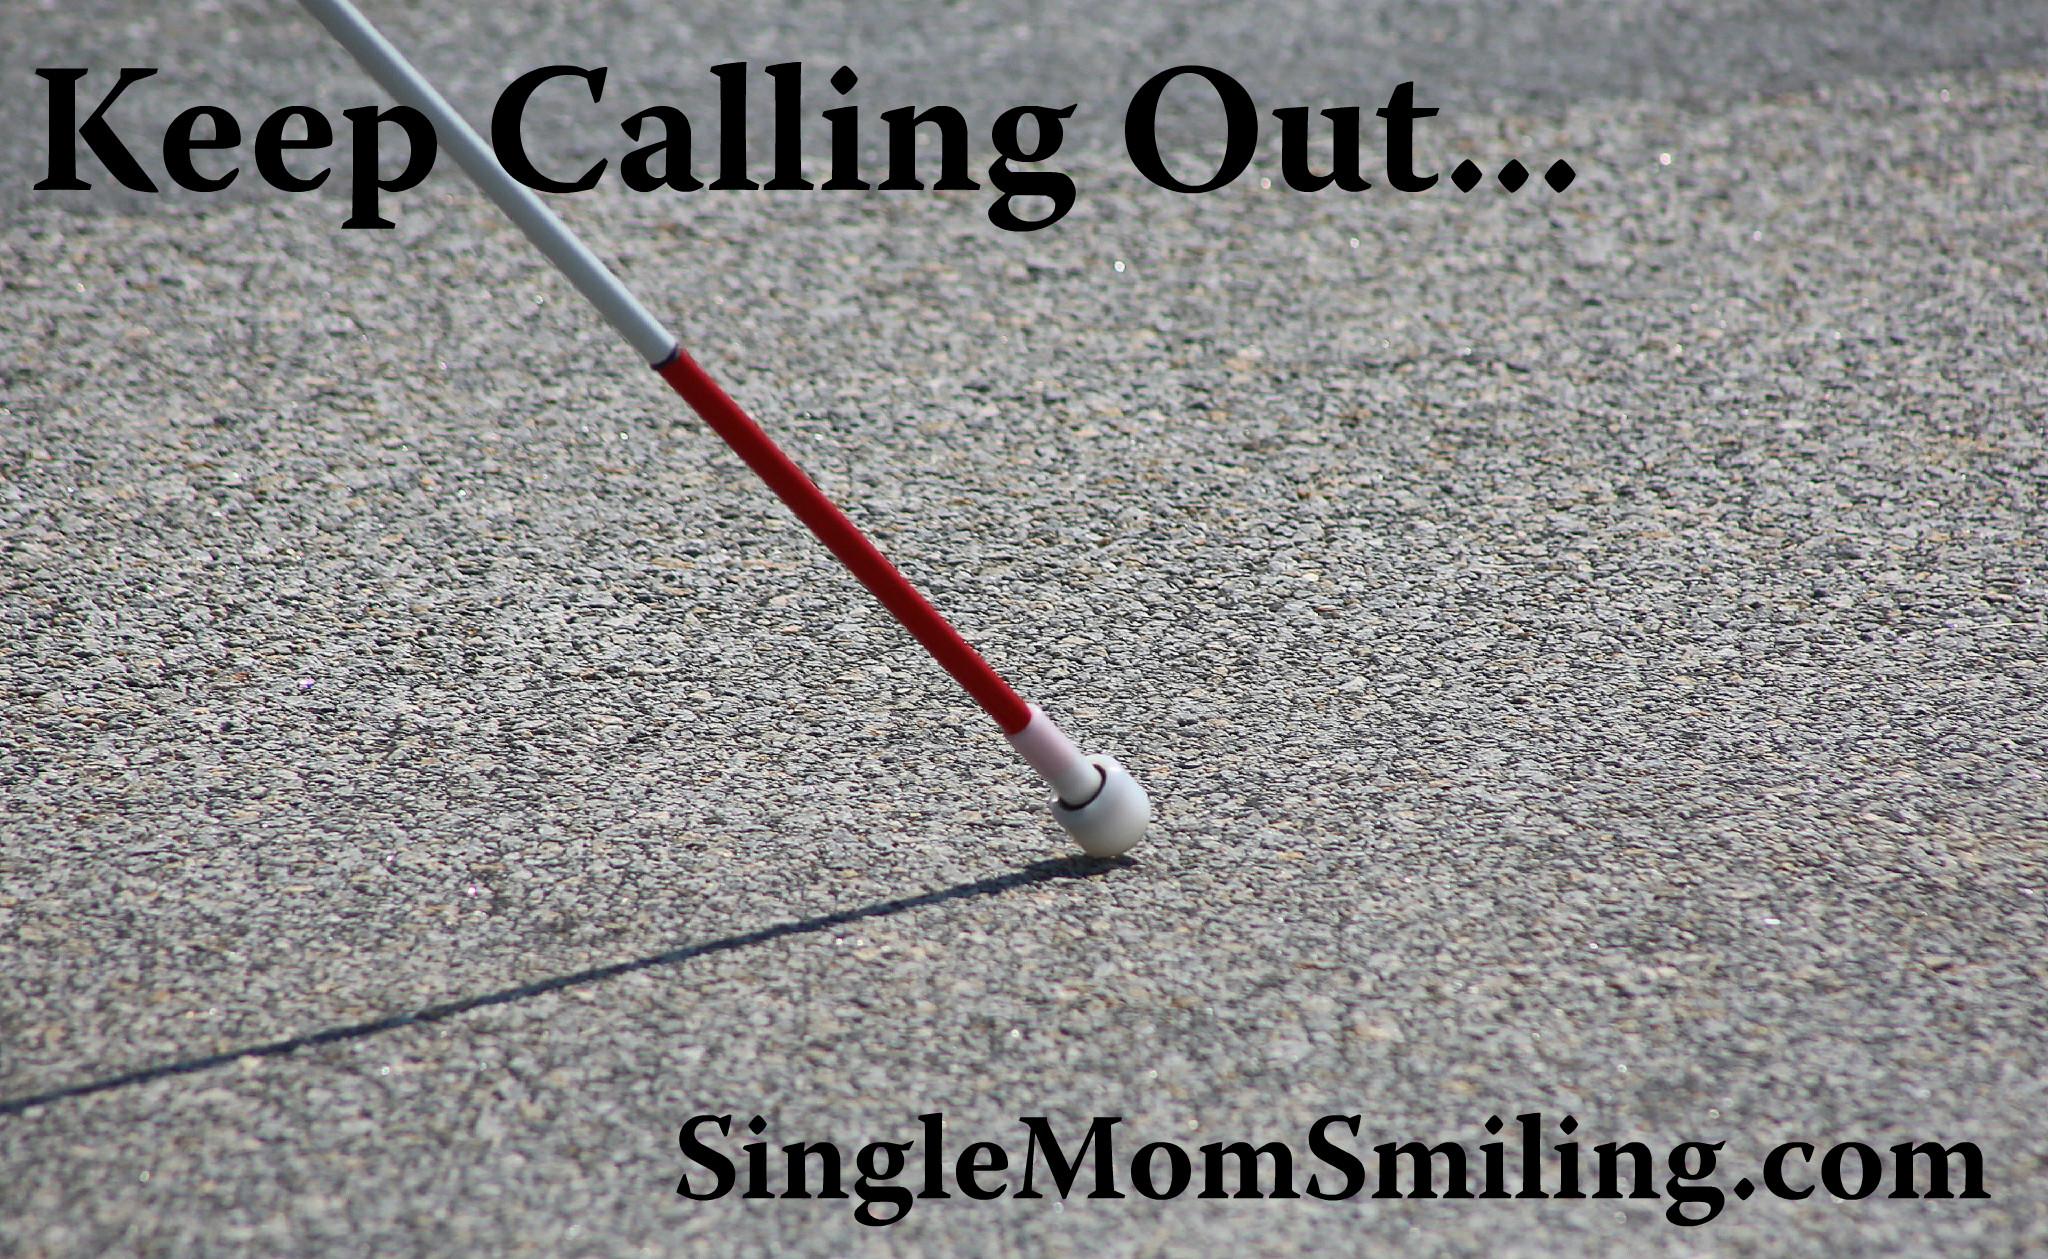 Keep Calling Out - Gospel Blind Man Cane - Single Mom Smiling